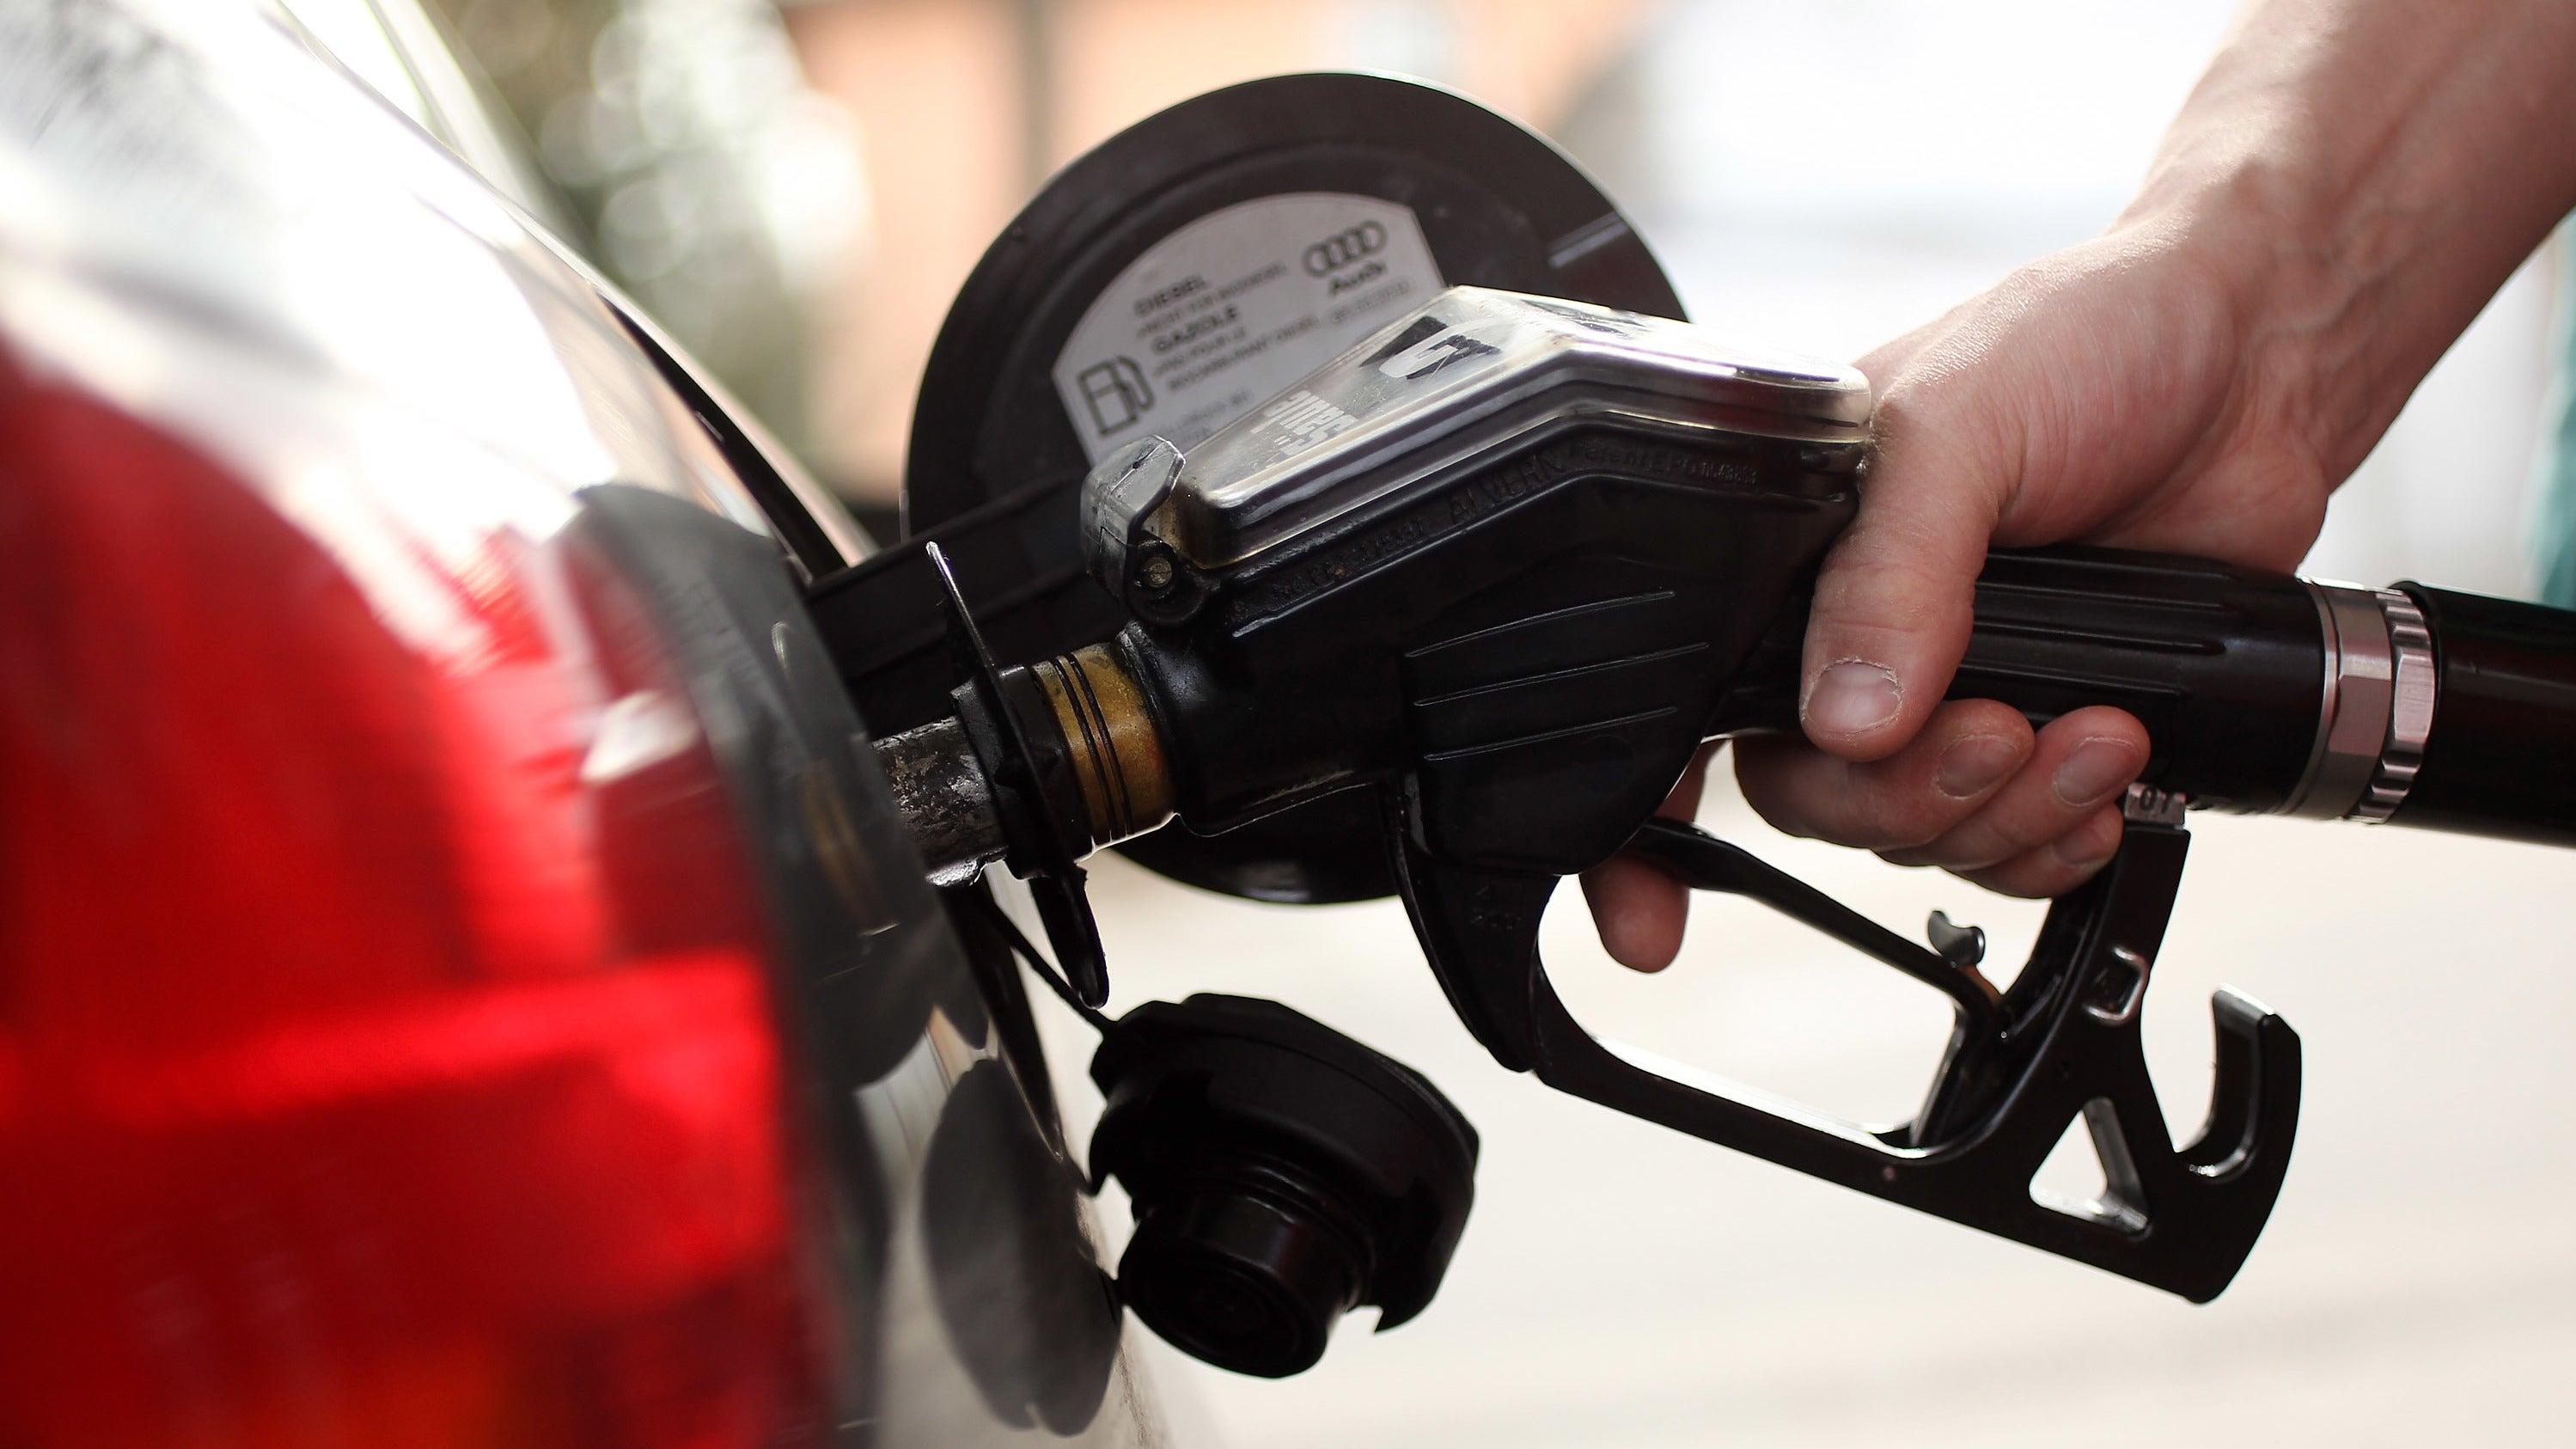 Buy Petrol On Mondays To Save Money